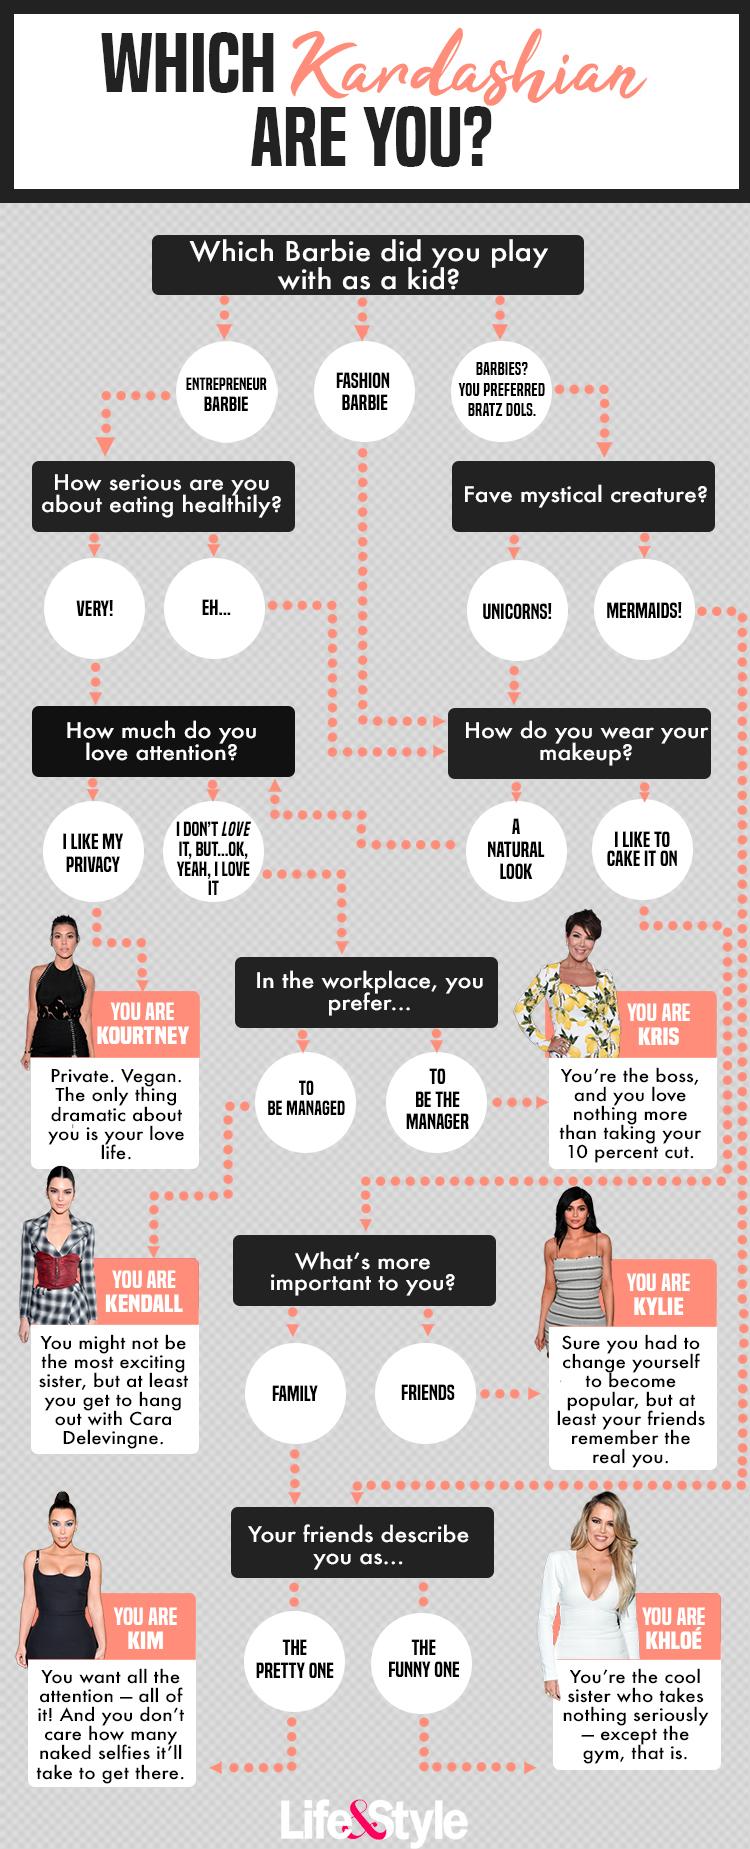 which kardashian are you